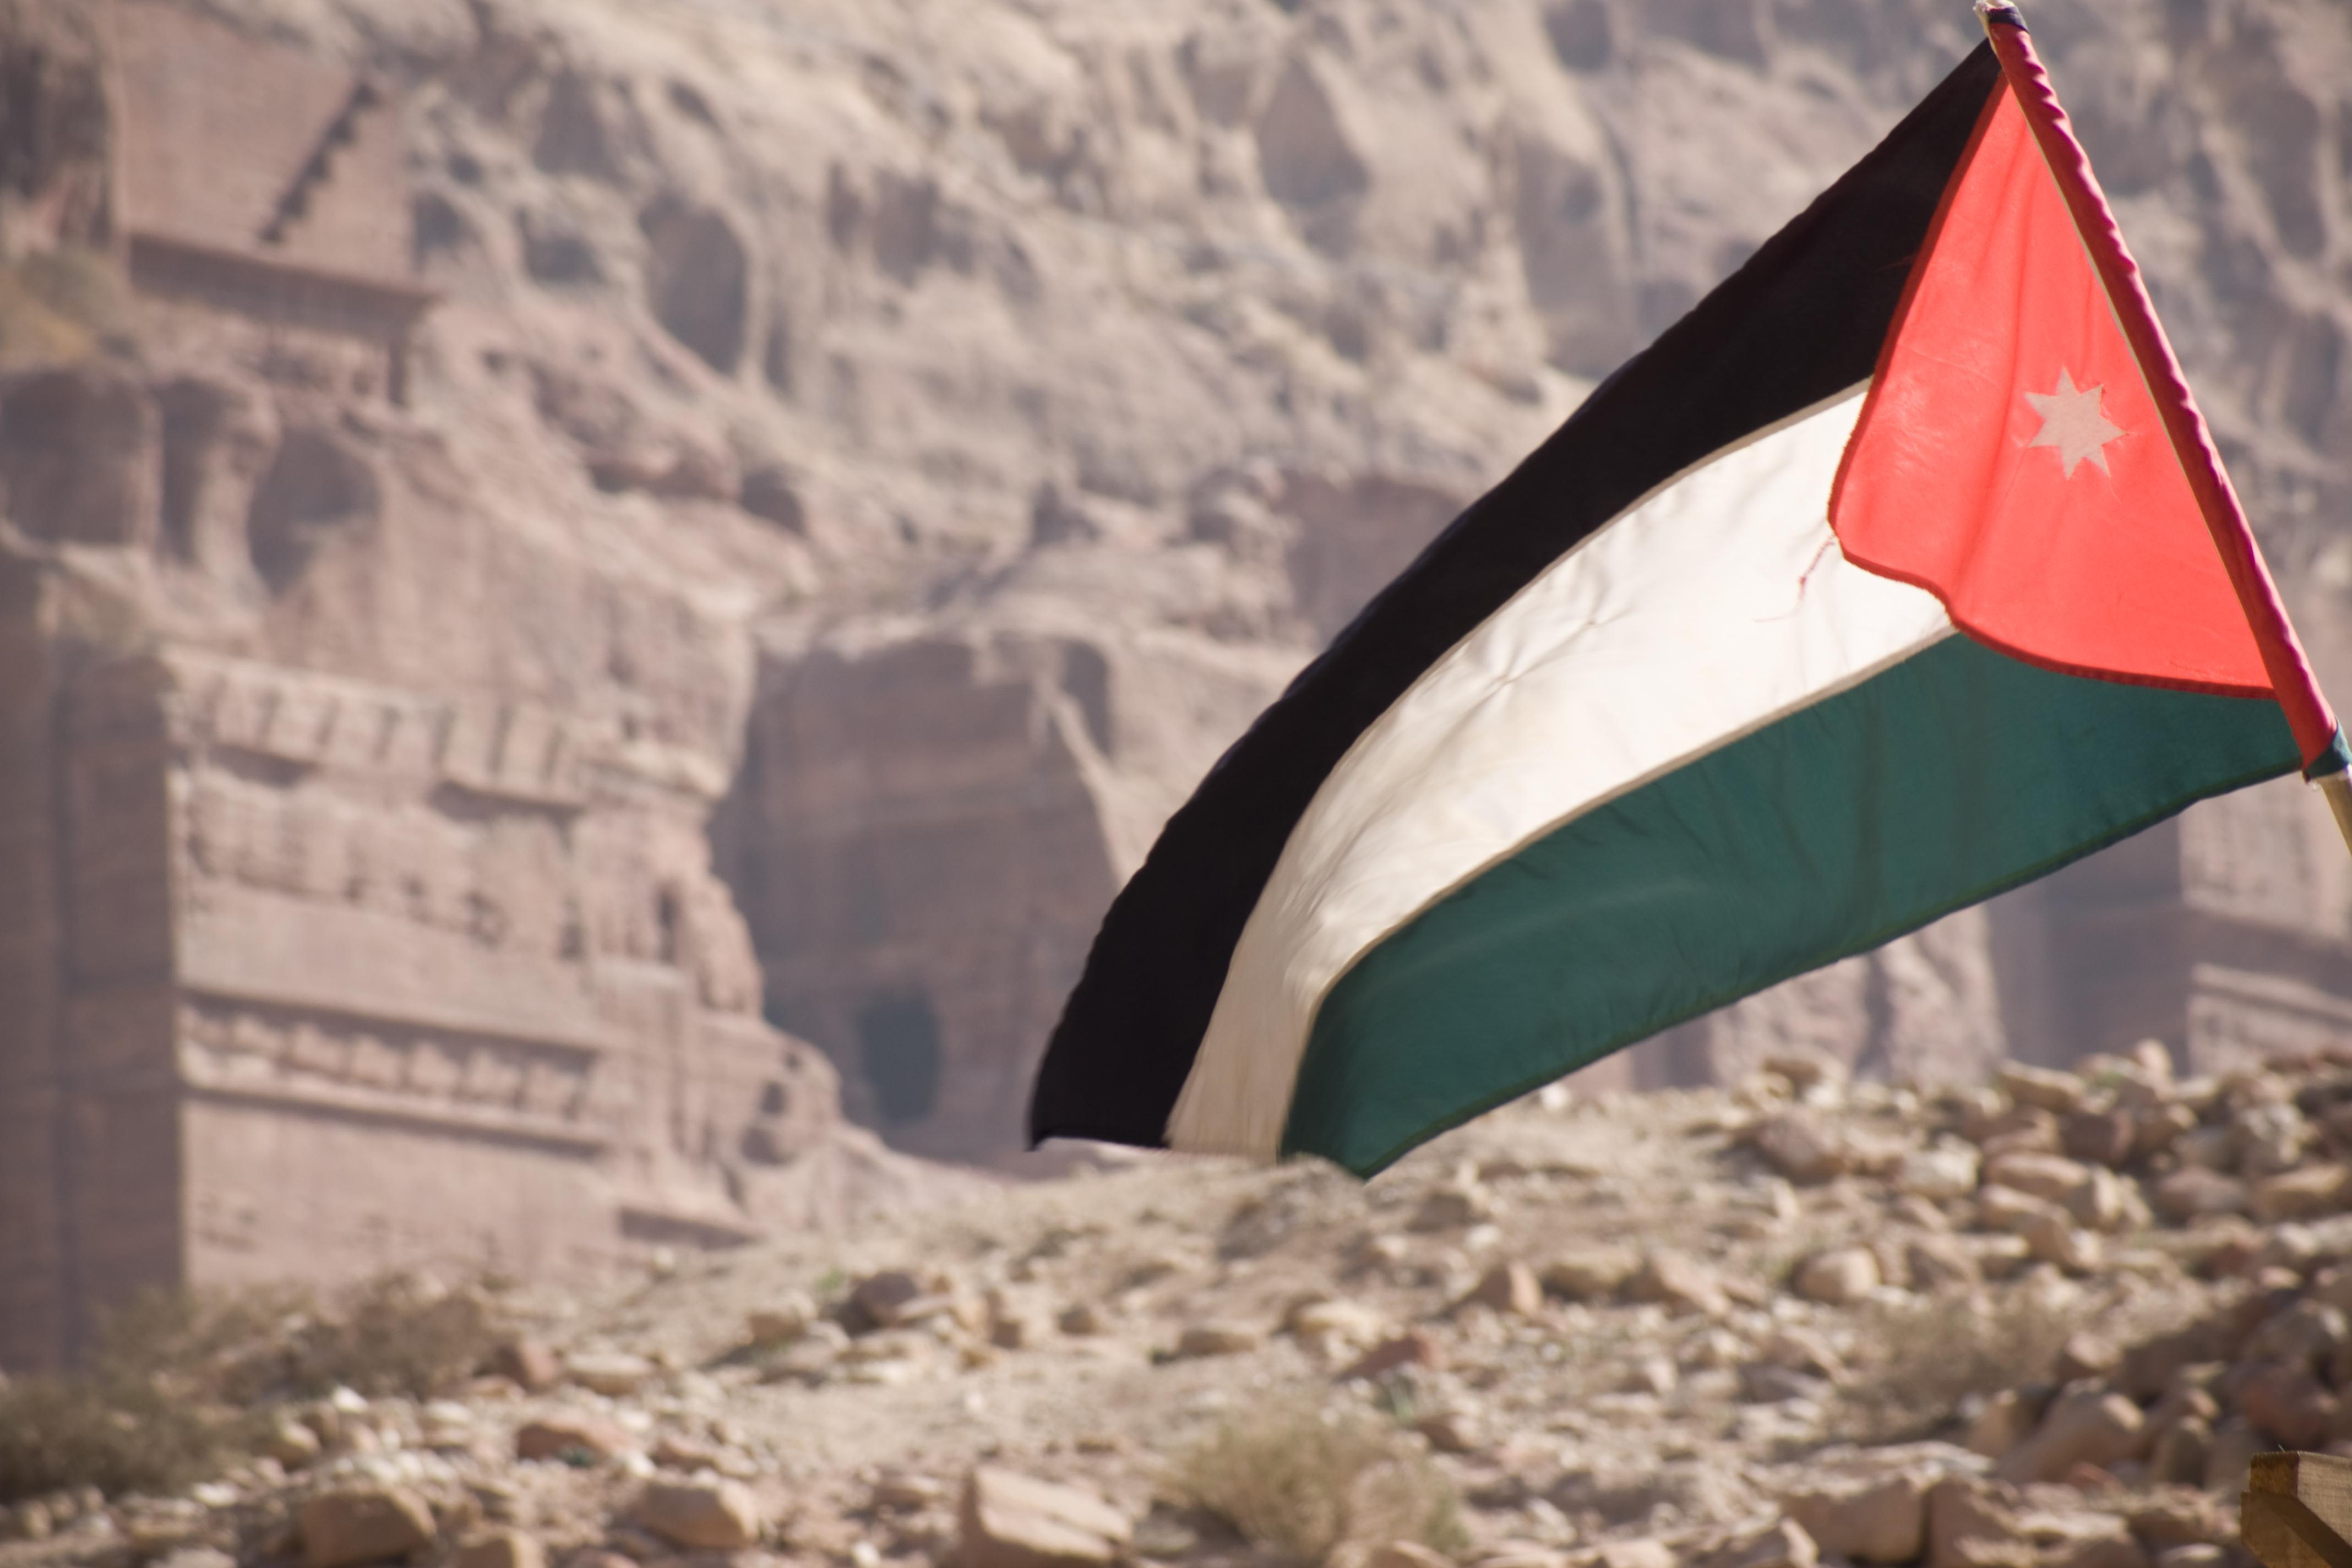 Jordan, Wikimedia commons